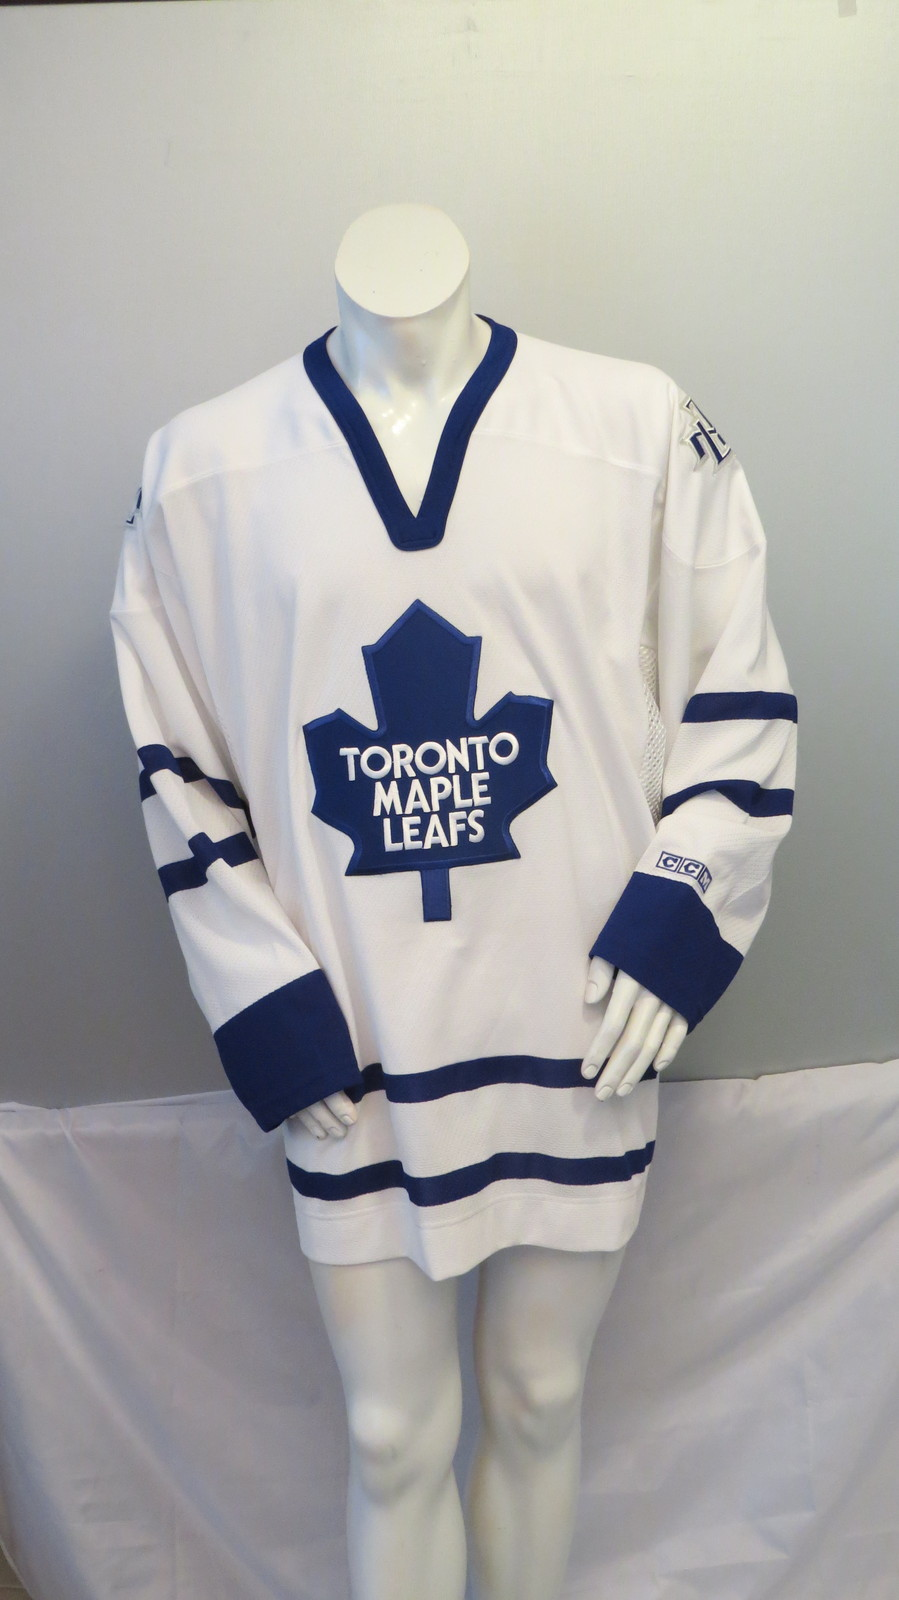 quality design 6b275 e26ed Toronto Maple Leafs Jersey (Retro) - Away and 19 similar items